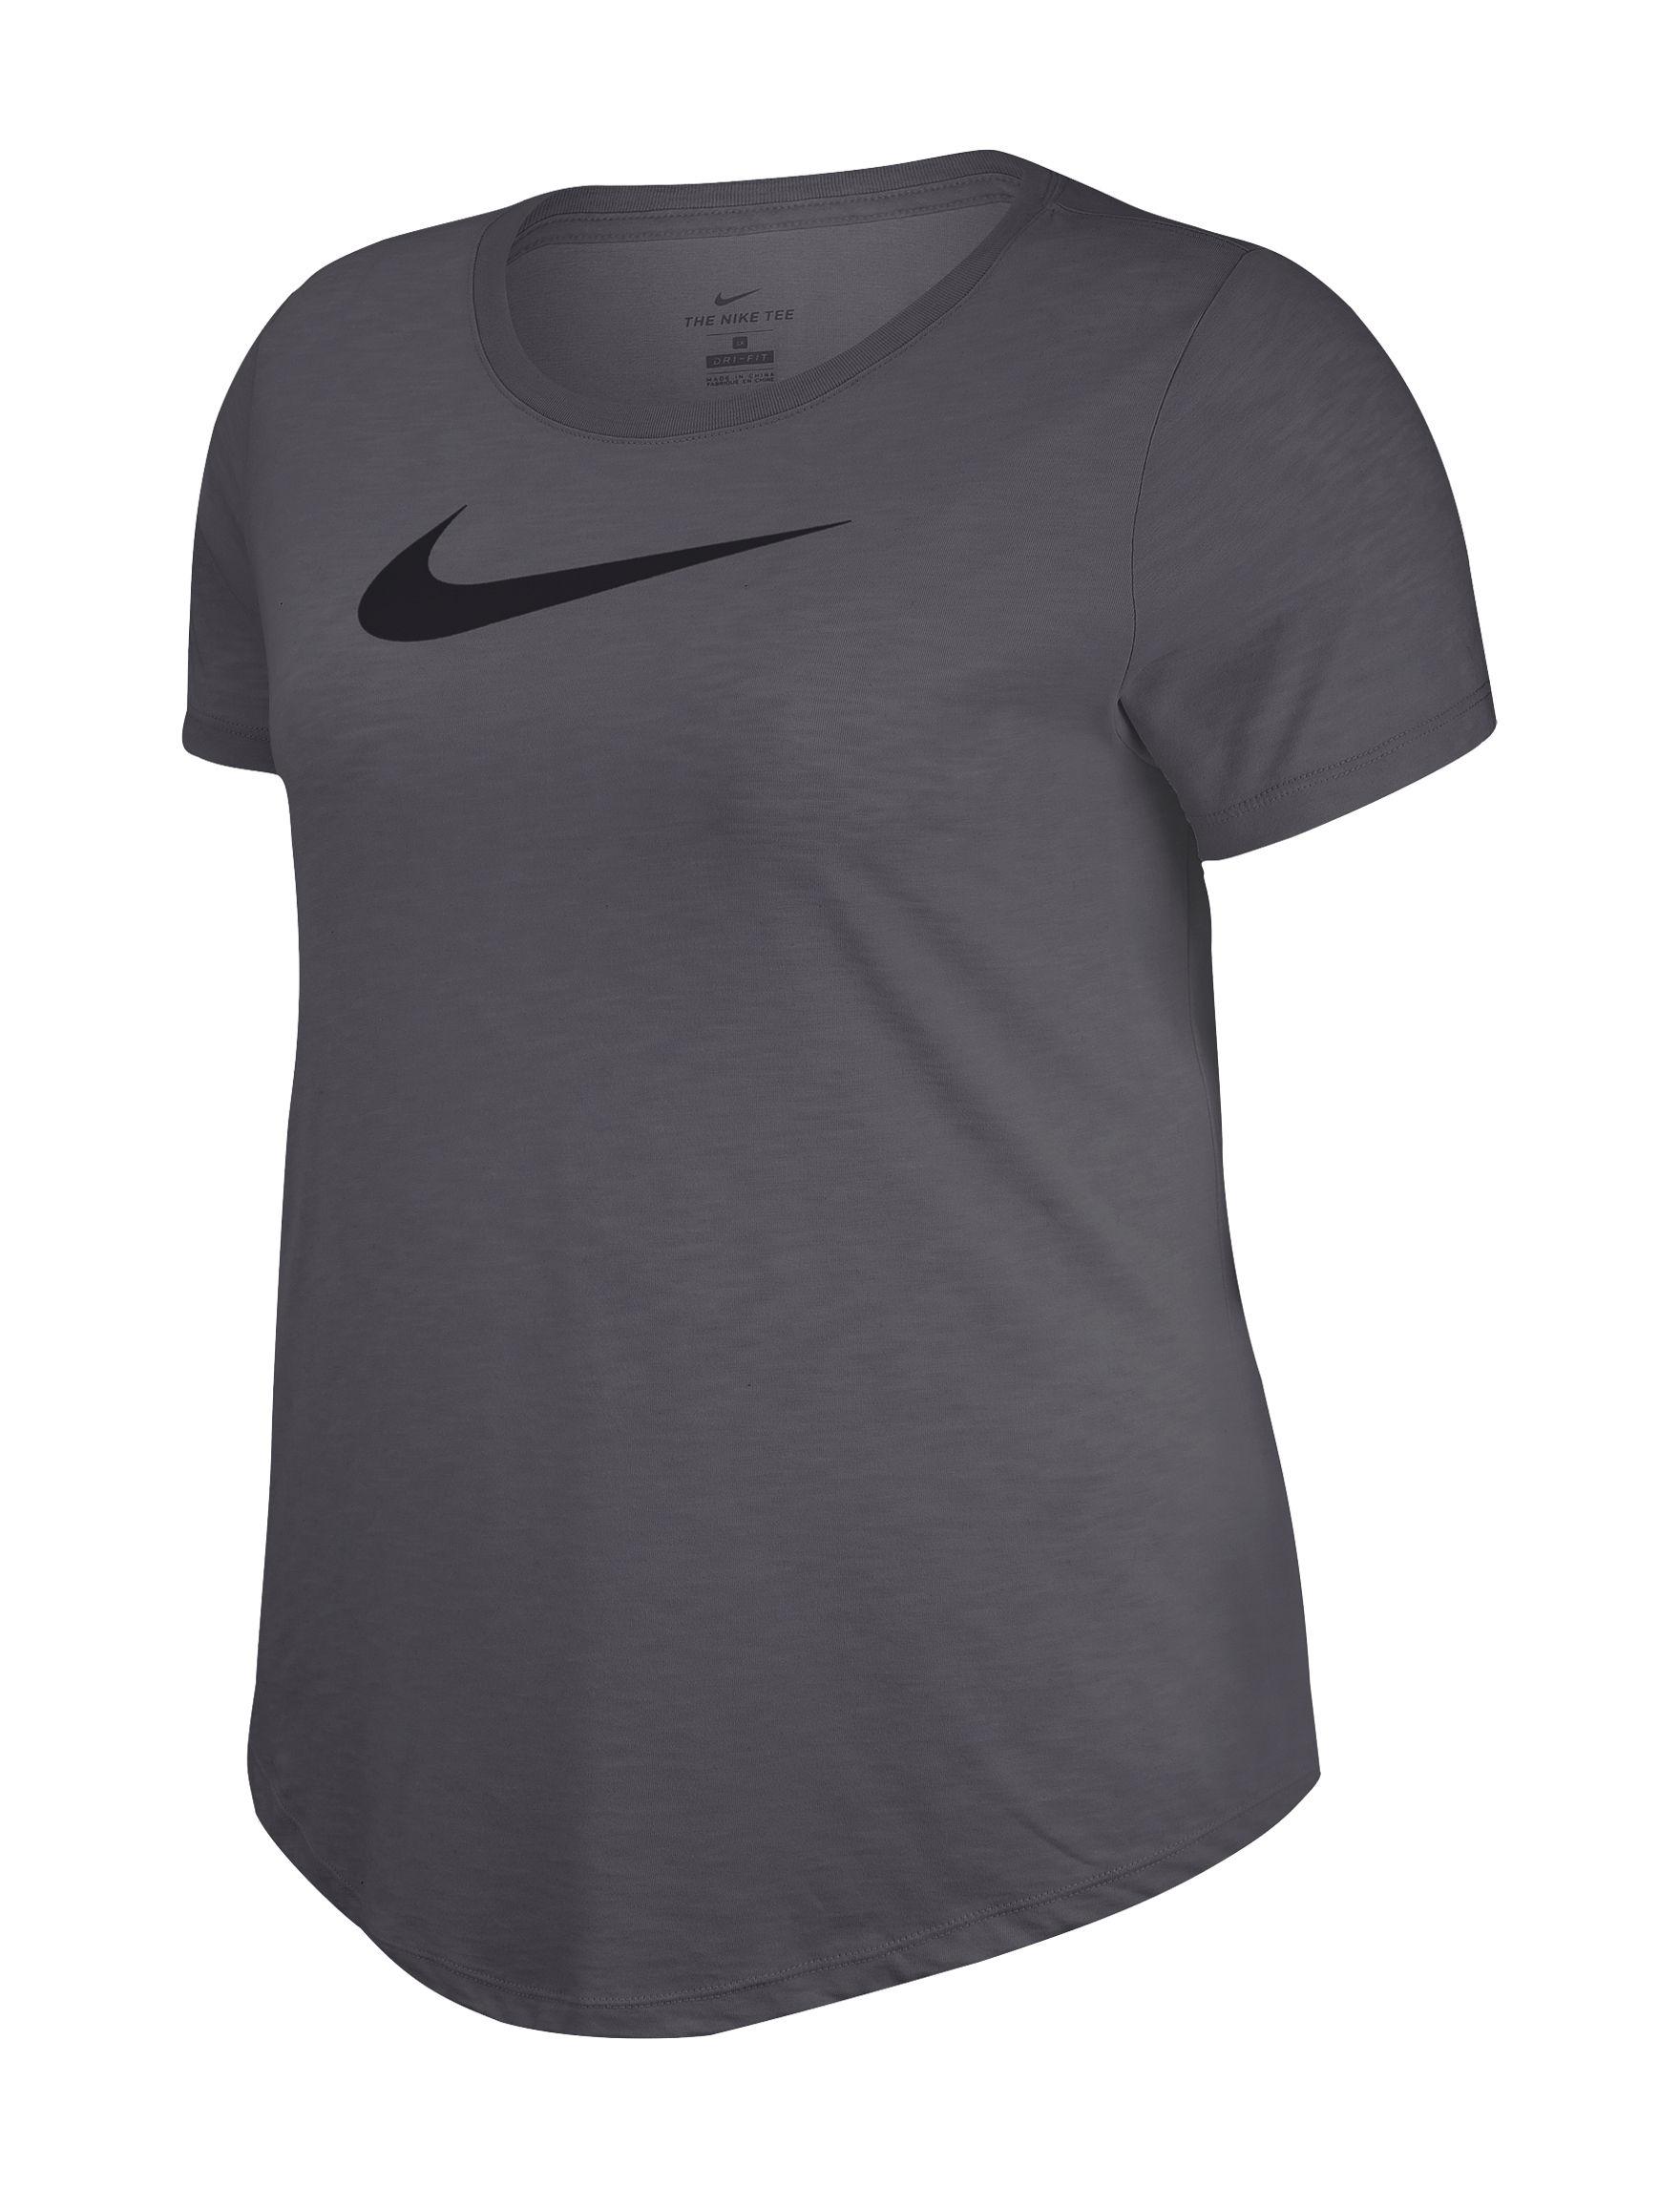 Nike Dark Heather Grey Active Tees & Tanks